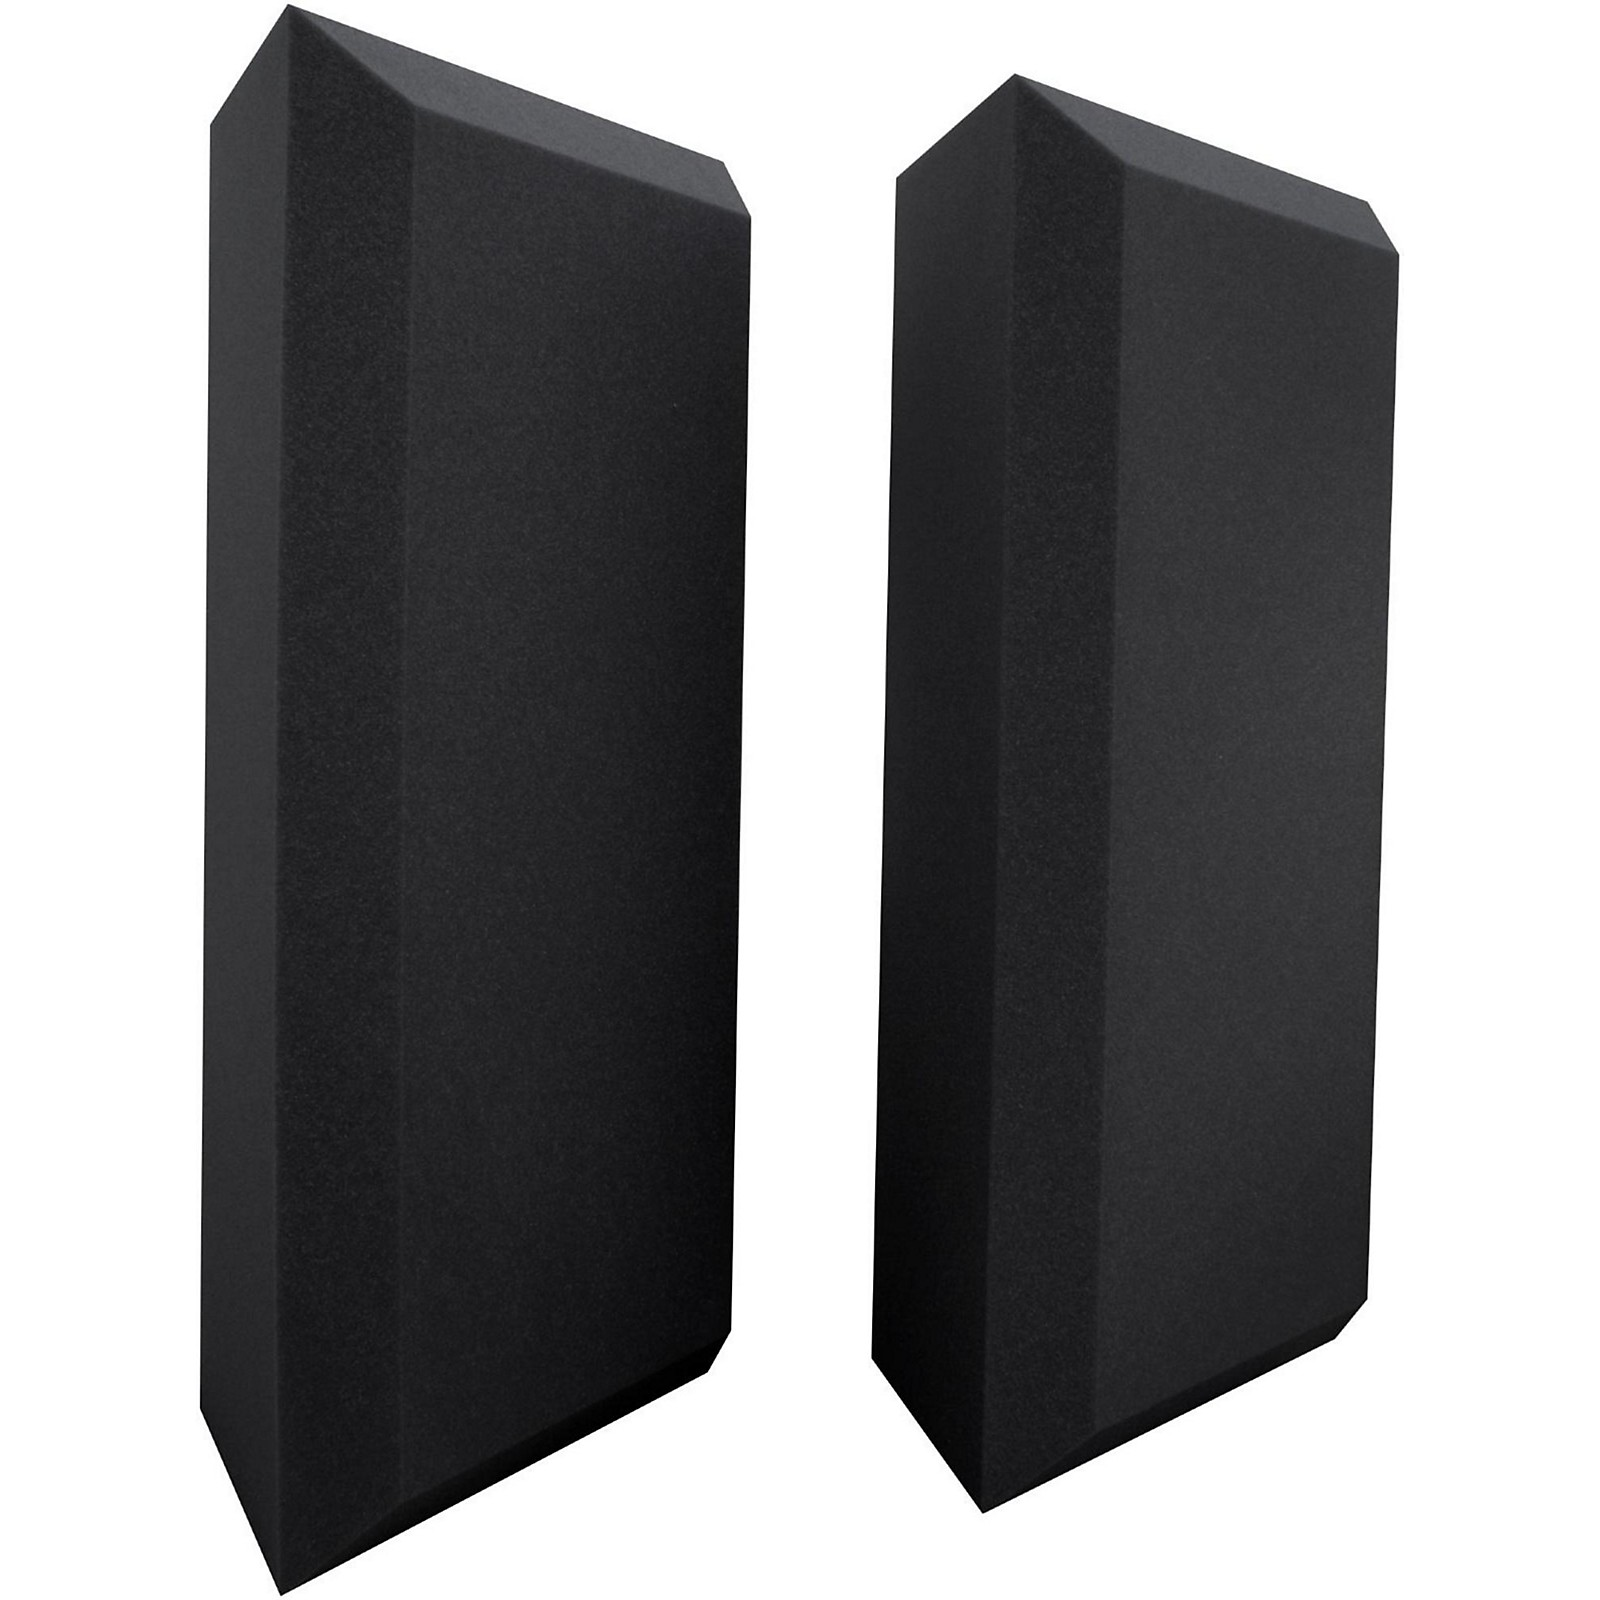 Open Box Ultimate Acoustics Acoustics Bass Trap - Bevel (2 Pack)